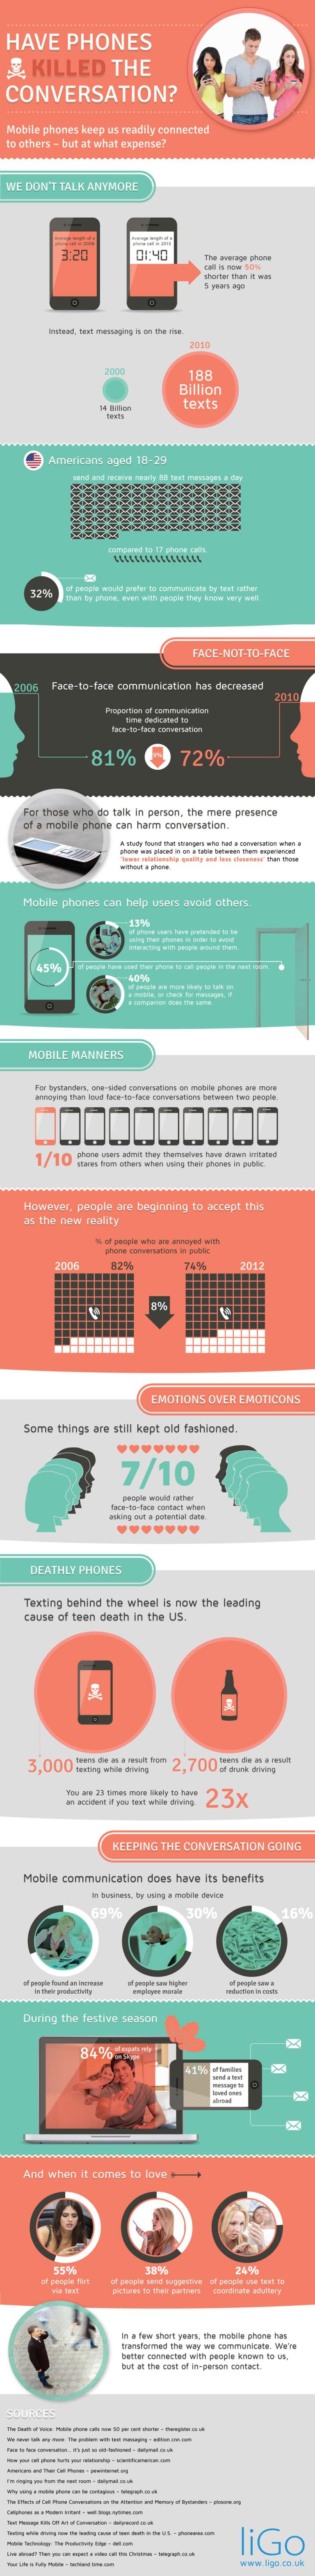 Smart Phones Killed Conversation (Infographic)